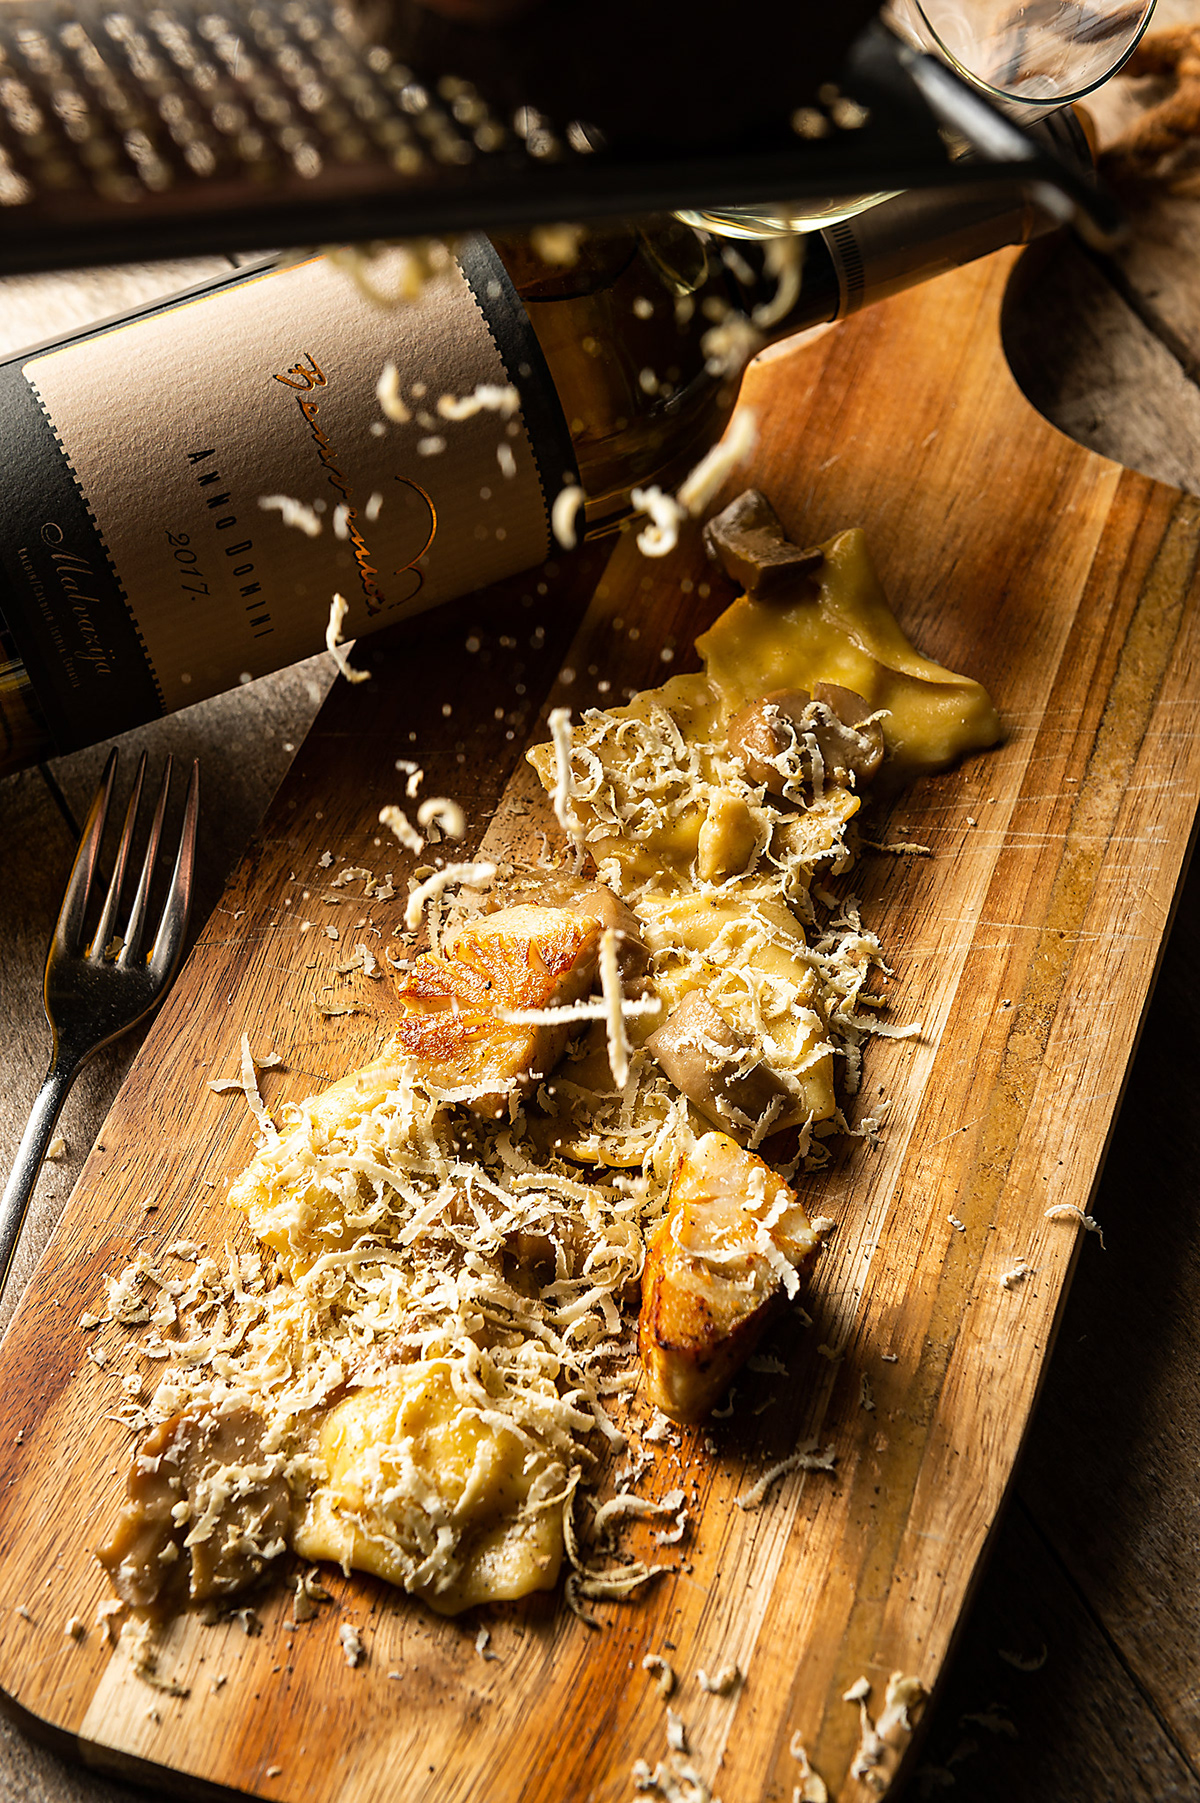 dejanhren plethoraofcreativity rivica hren dražen lesica Benvenuti wine dine Food